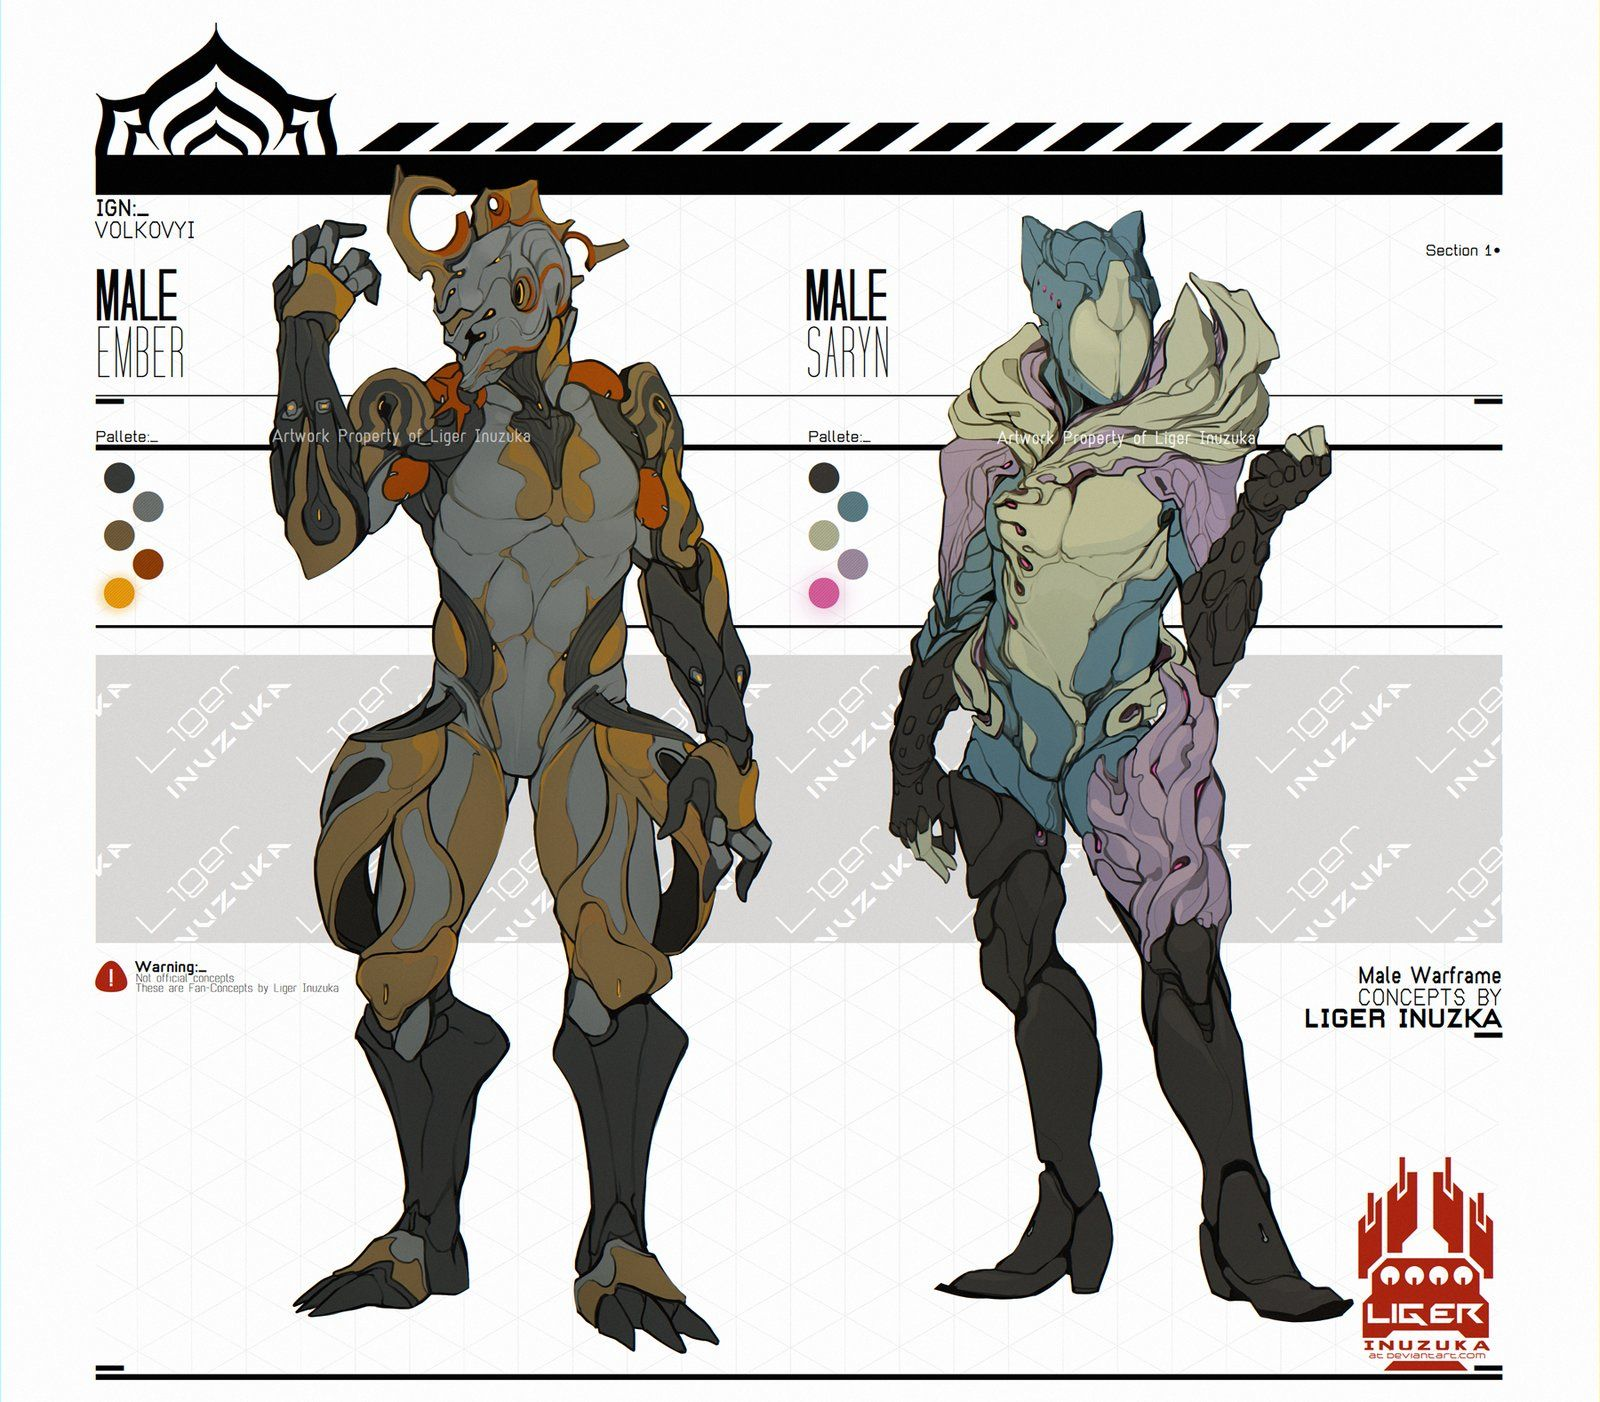 Warframe: Male Saryn and Male Ember Concept, Liger Inuzuka on ArtStation at https://www.artstation.com/artwork/warframe-male-saryn-and-male-ember-concept